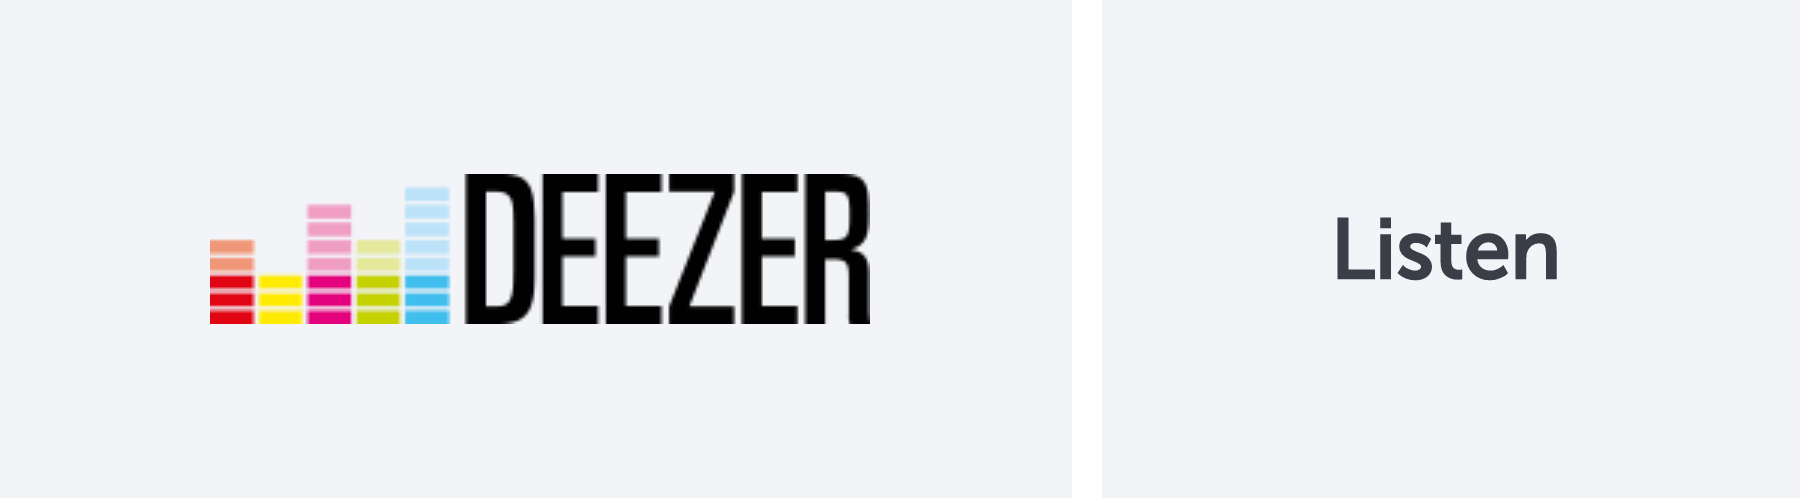 Deezer-###.png